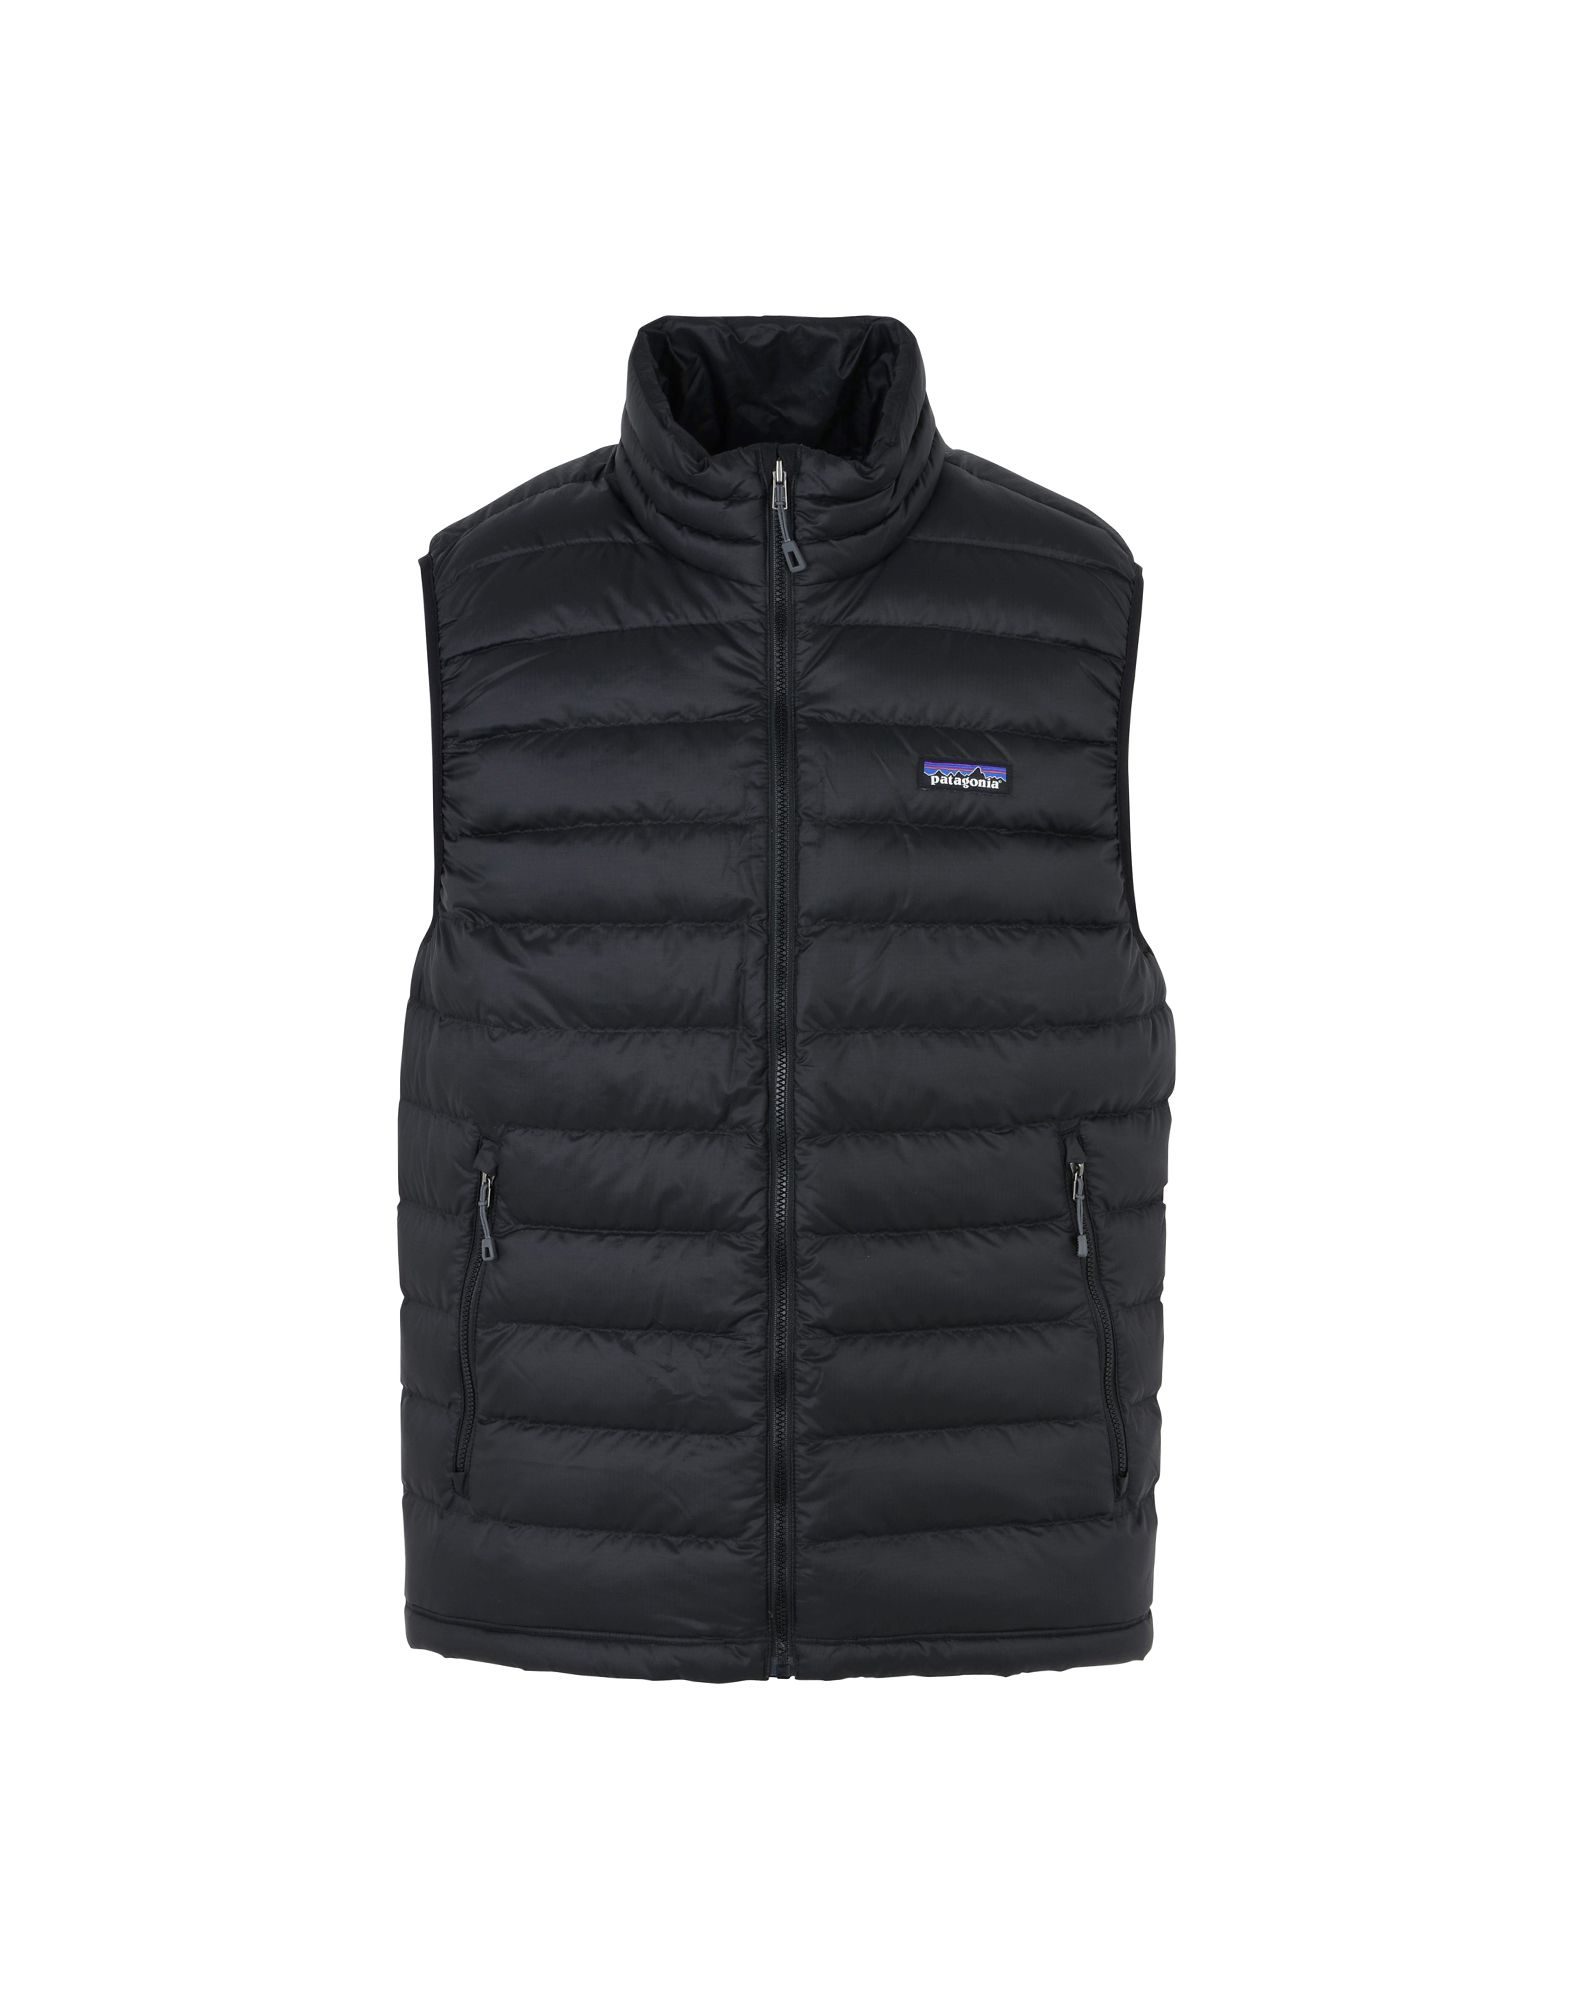 Gilet Patagonia M's Down Sweater Vest - Uomo Uomo - - 41754628RB 406aa2